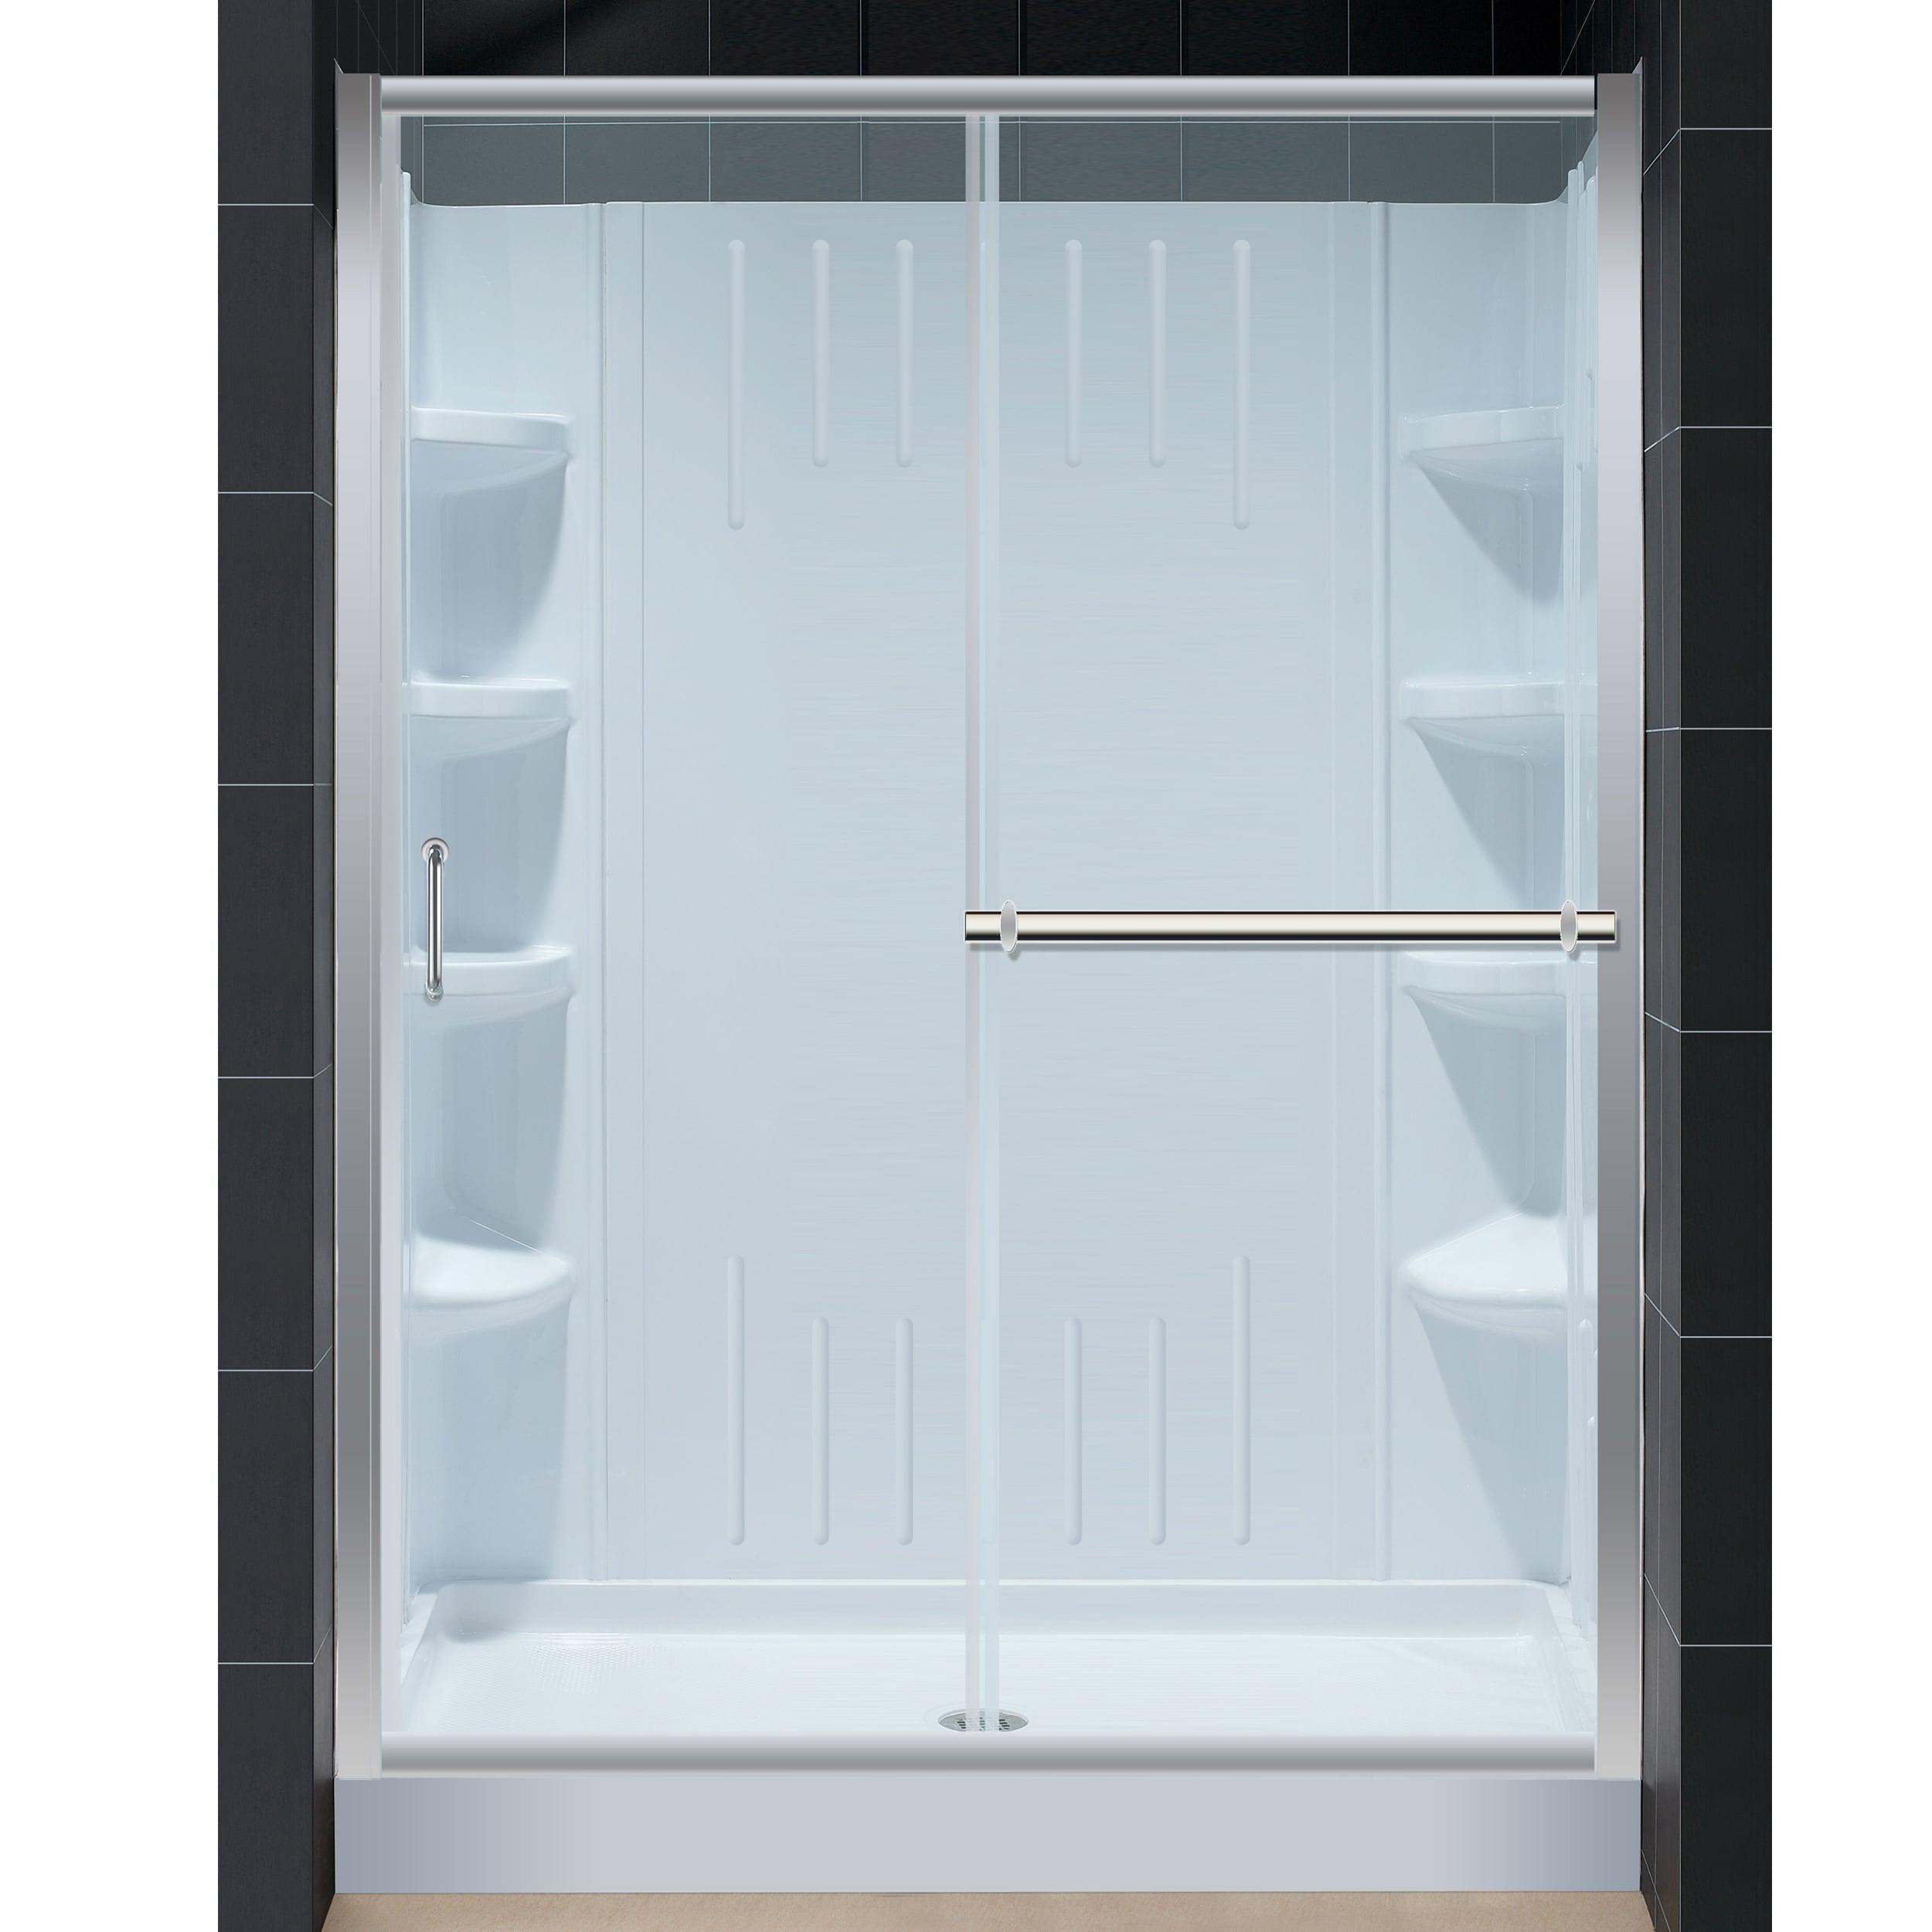 DreamLine Infinity Plus 60x72 Shower Door/ Amazon 32x60 Shower Base/ Backwall